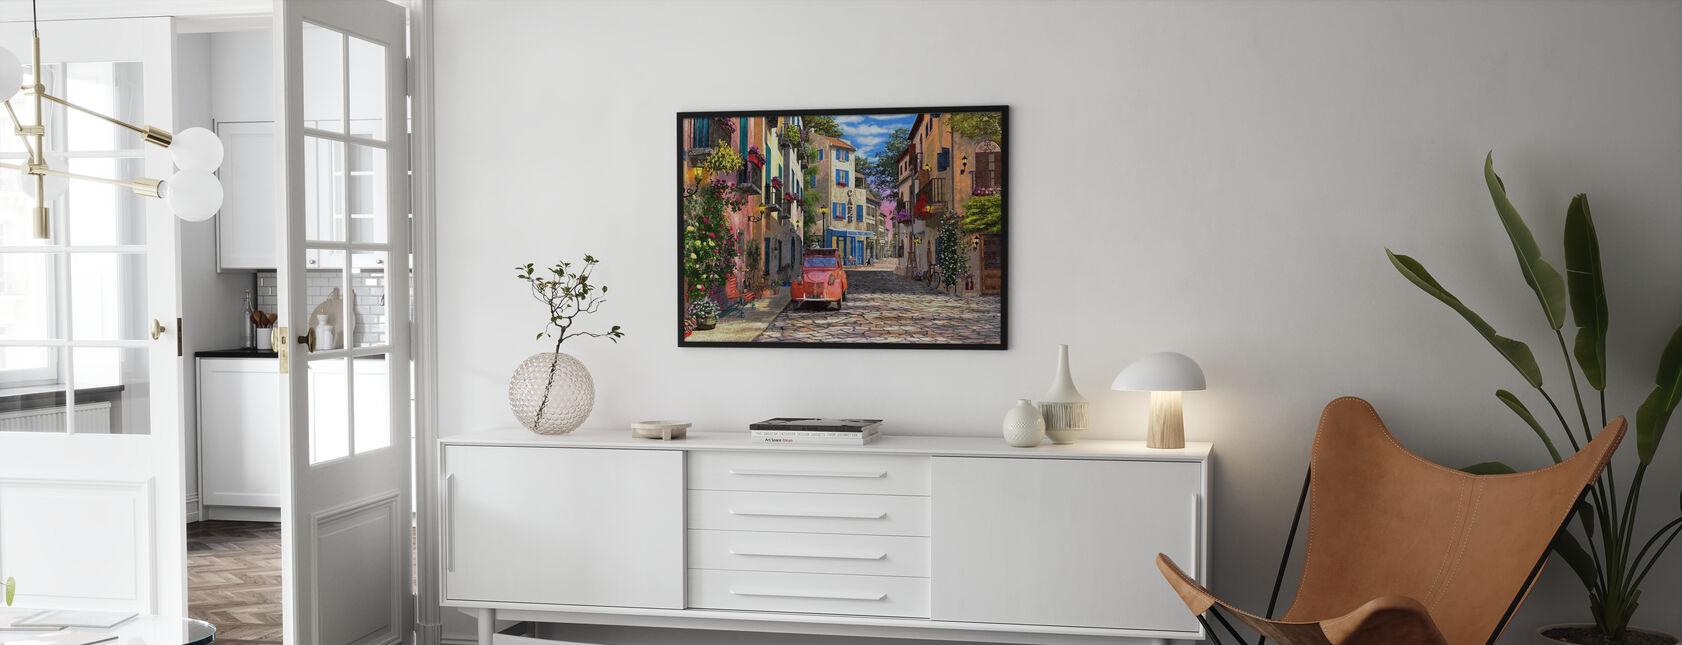 Rue Francais - Inramad tavla - Vardagsrum